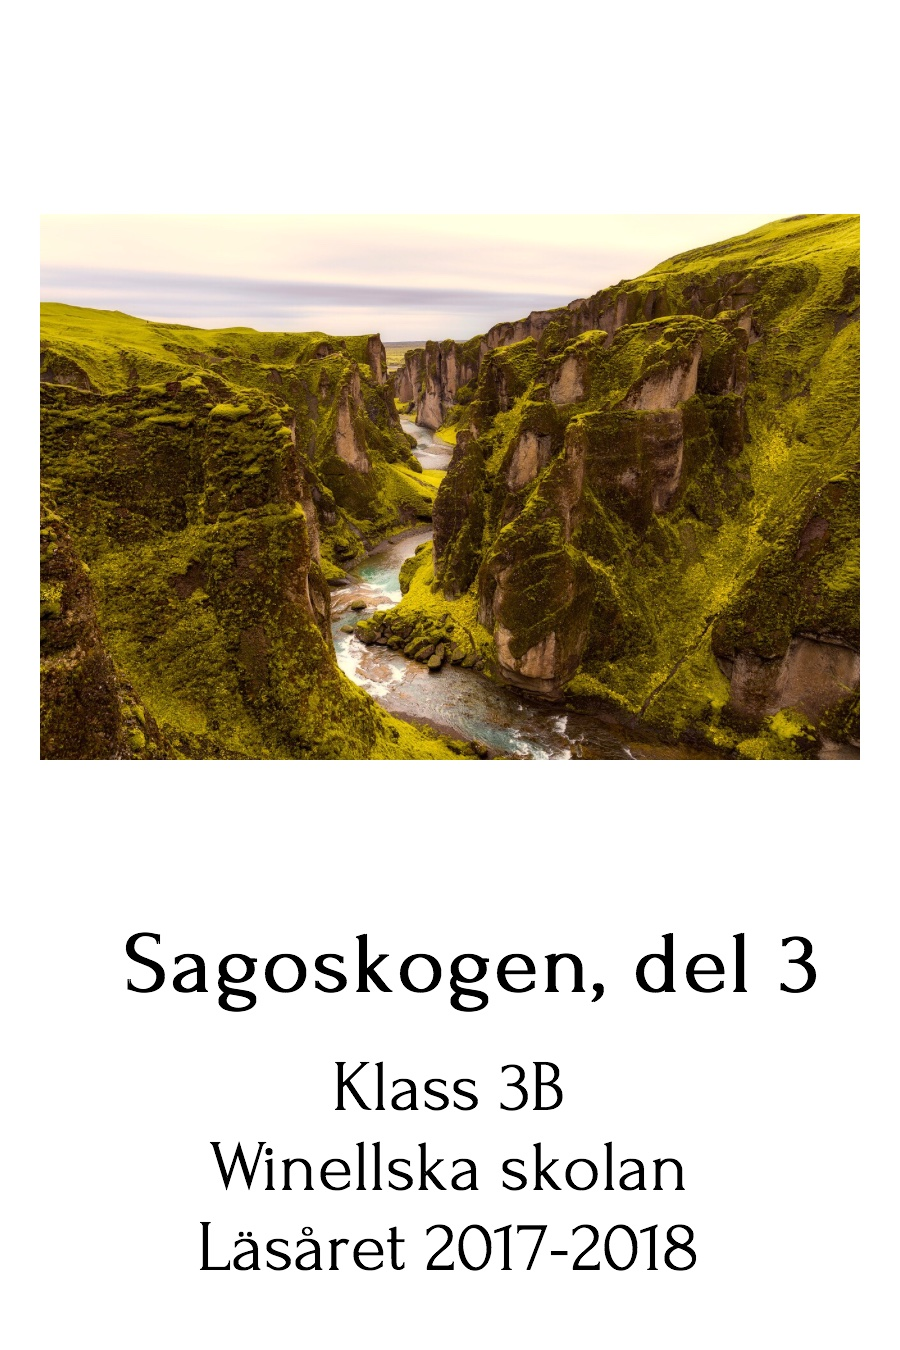 Sagoskogen, del 3